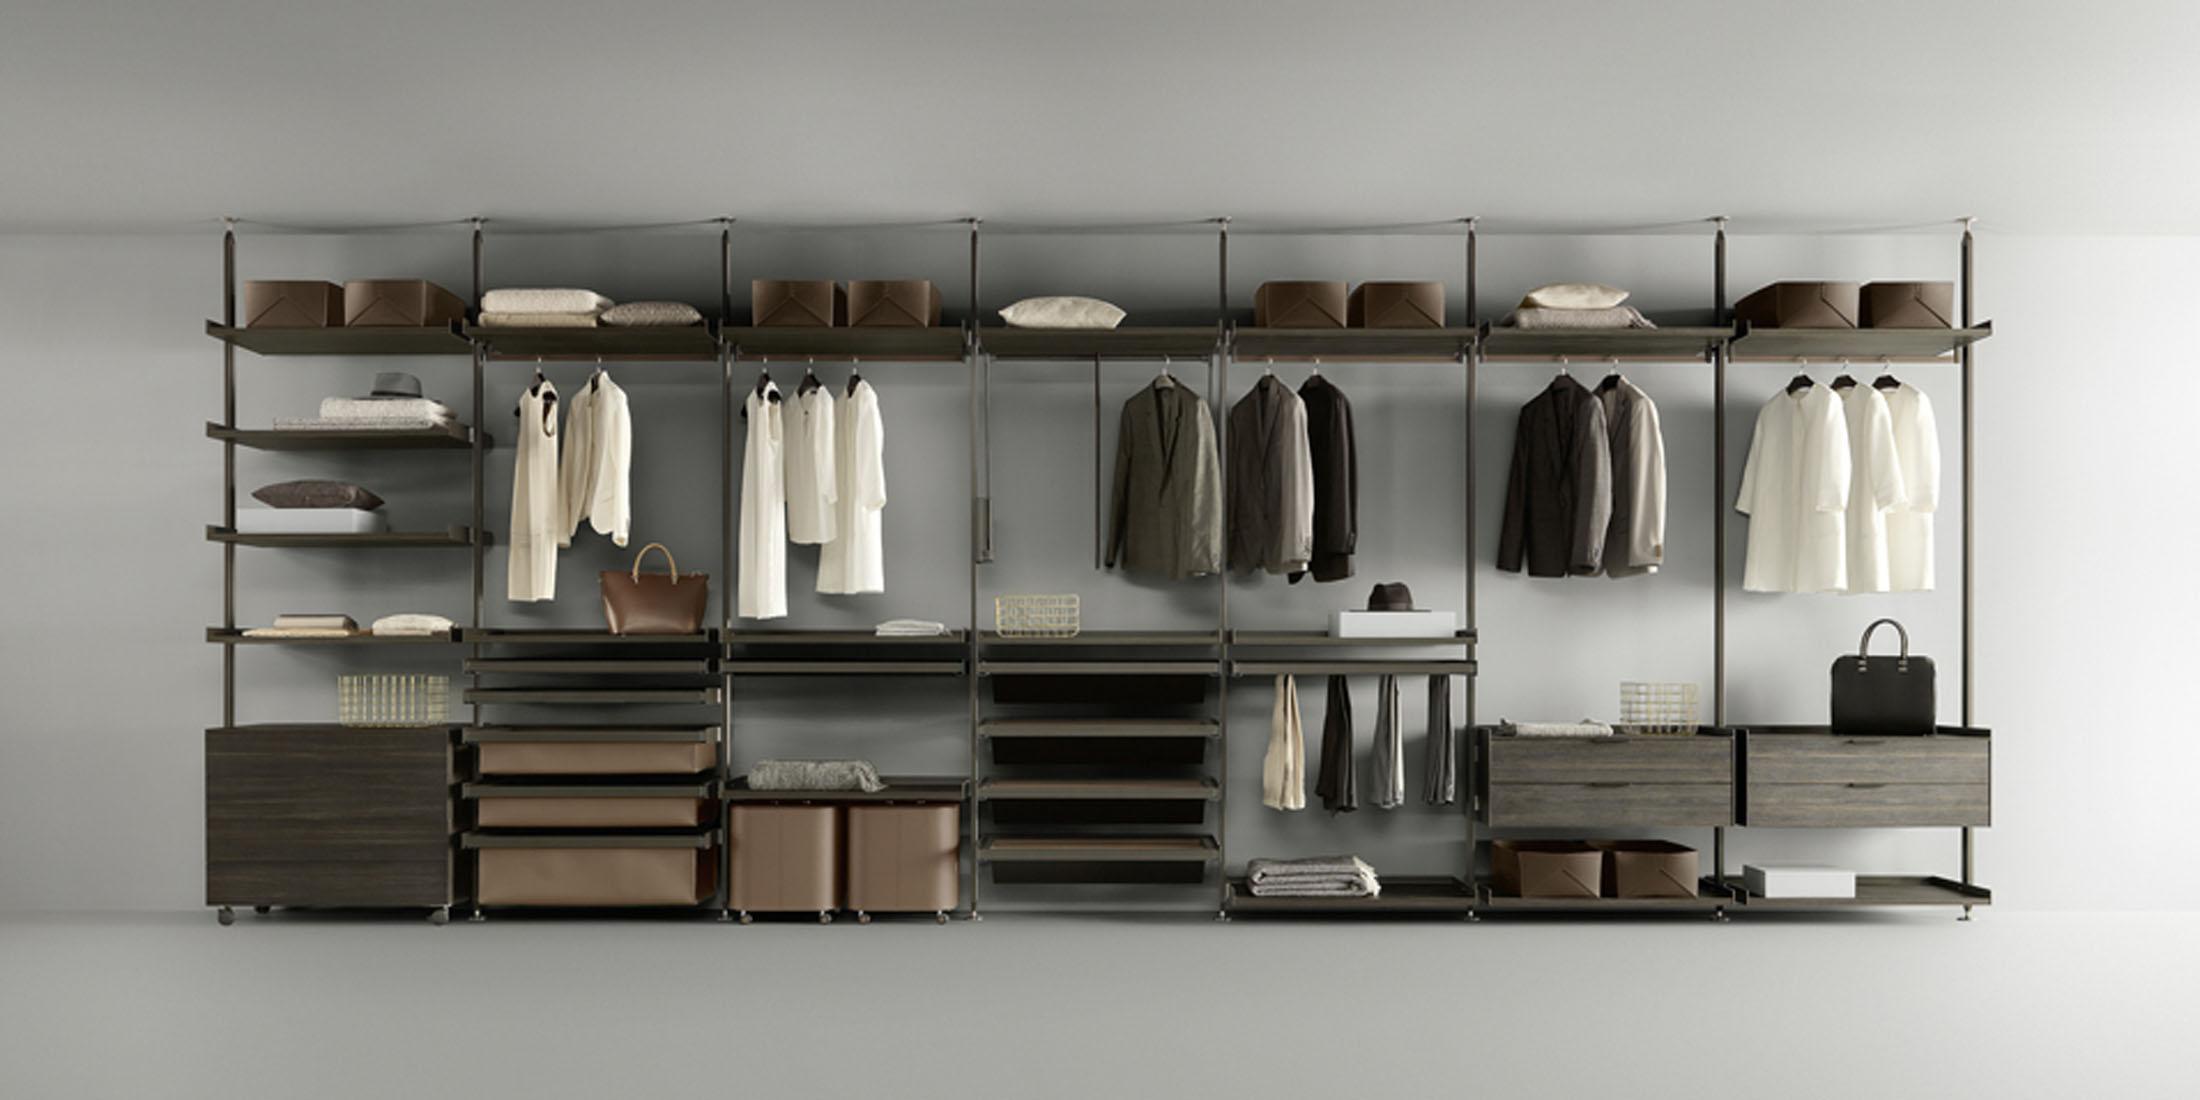 Dressing moderne haut de gamme rimadesio-zenit-3 distributeur exclusif Annecy